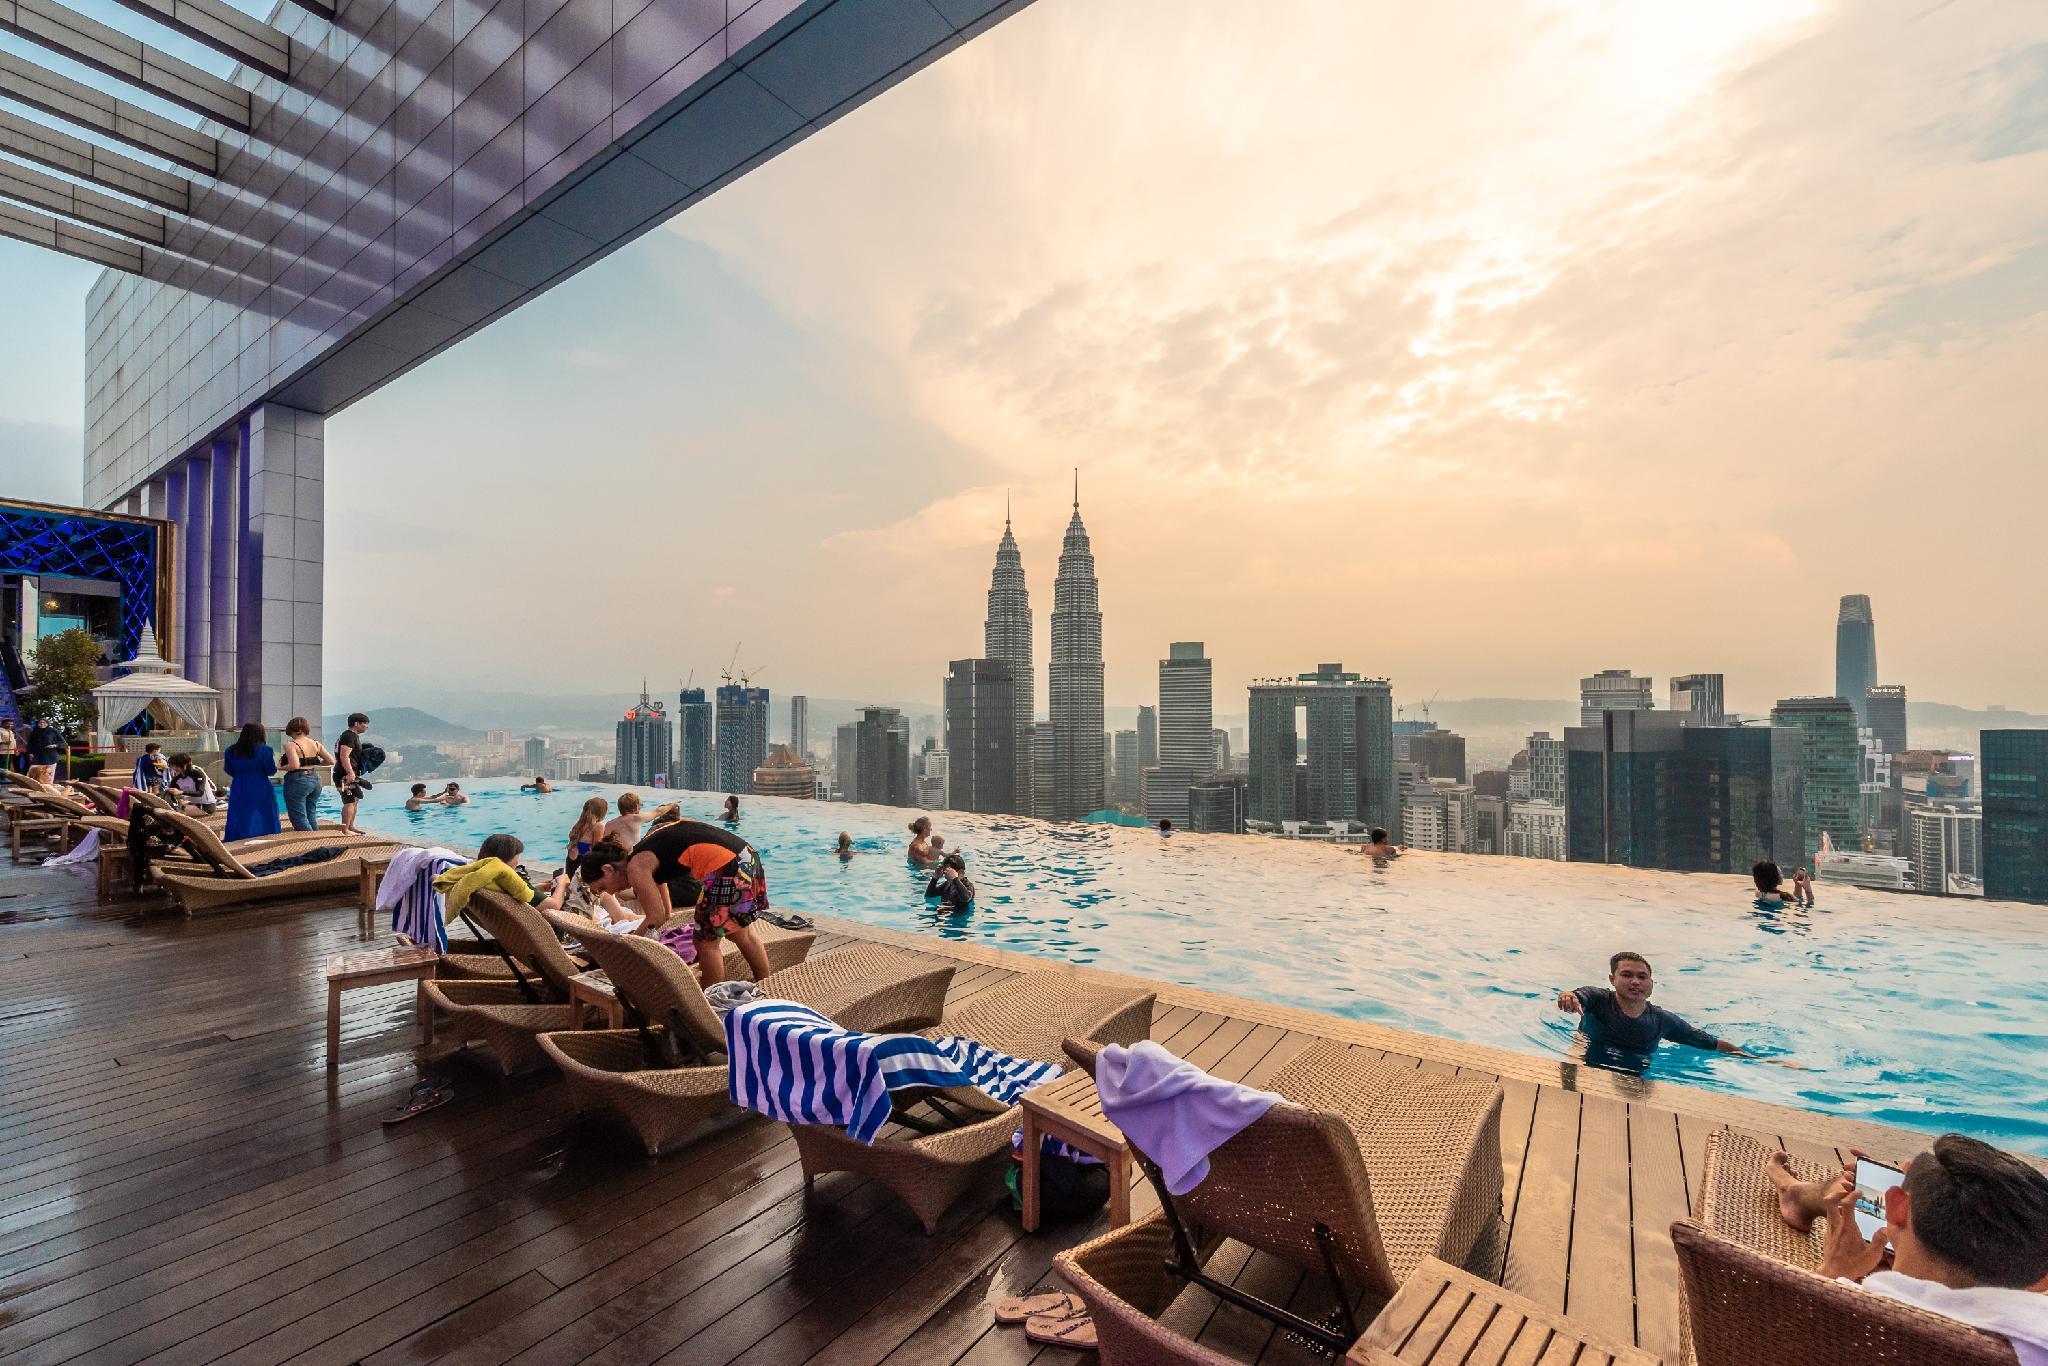 KLCC Twin Towers Infinity Pool 116-16 pax L-16 - Kuala Lumpur